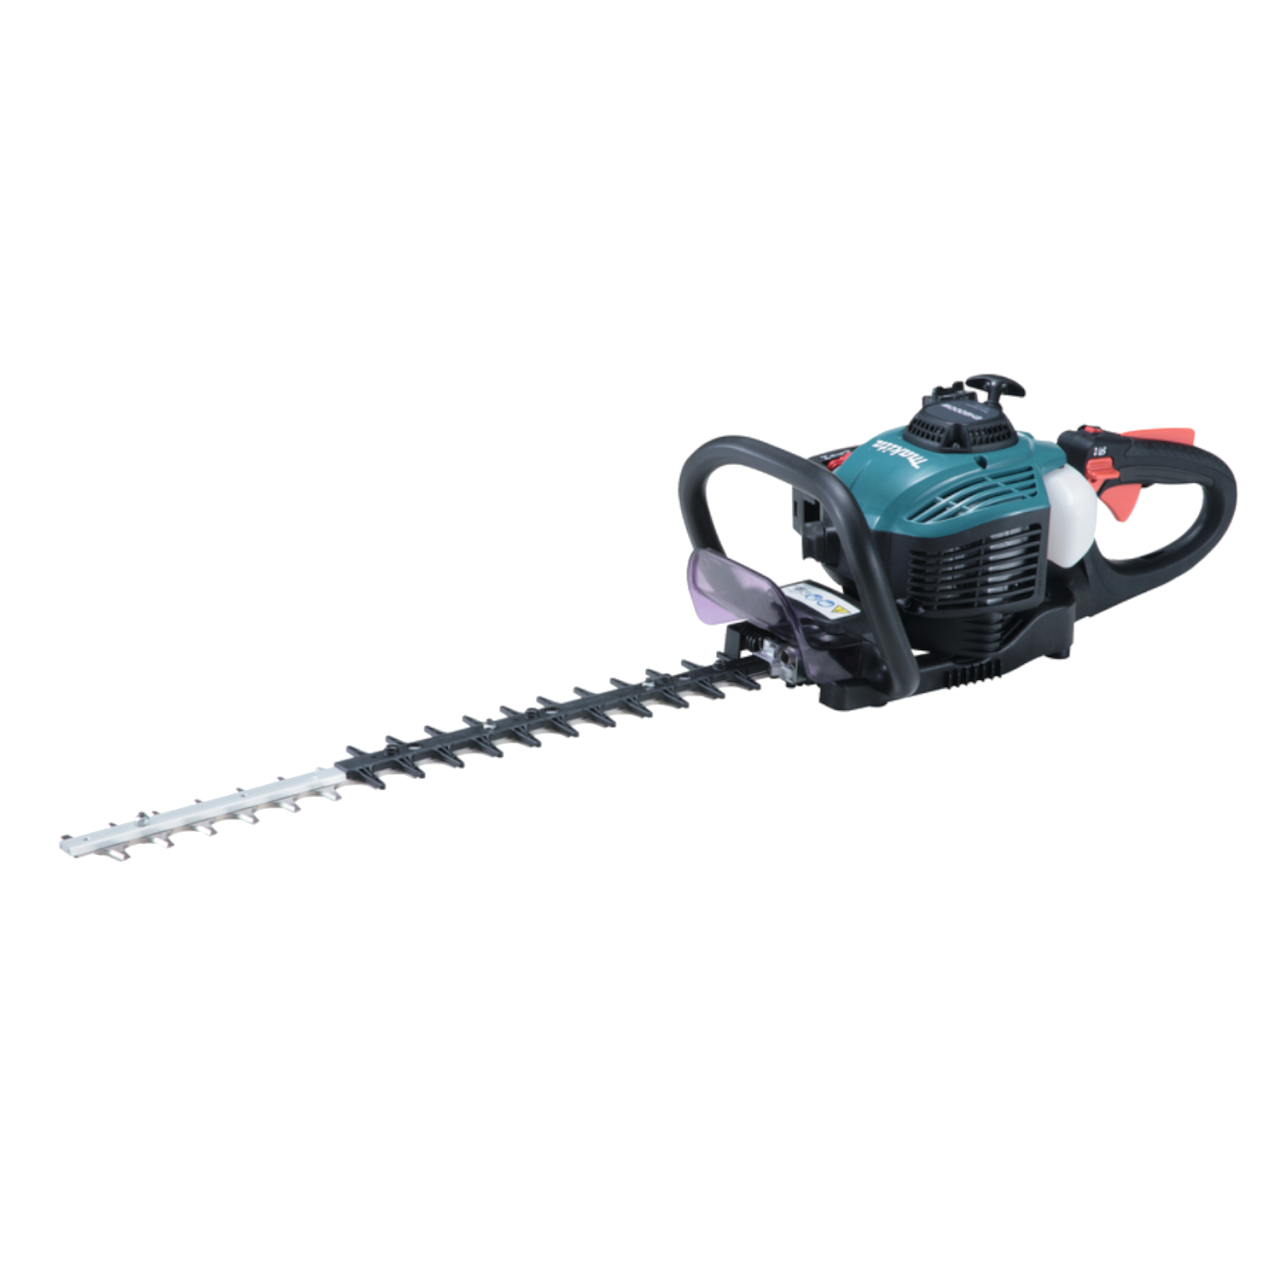 Makita Benzin-Heckenschere EH6000W 60cm Schnittlänge verstellbarer Handgriff